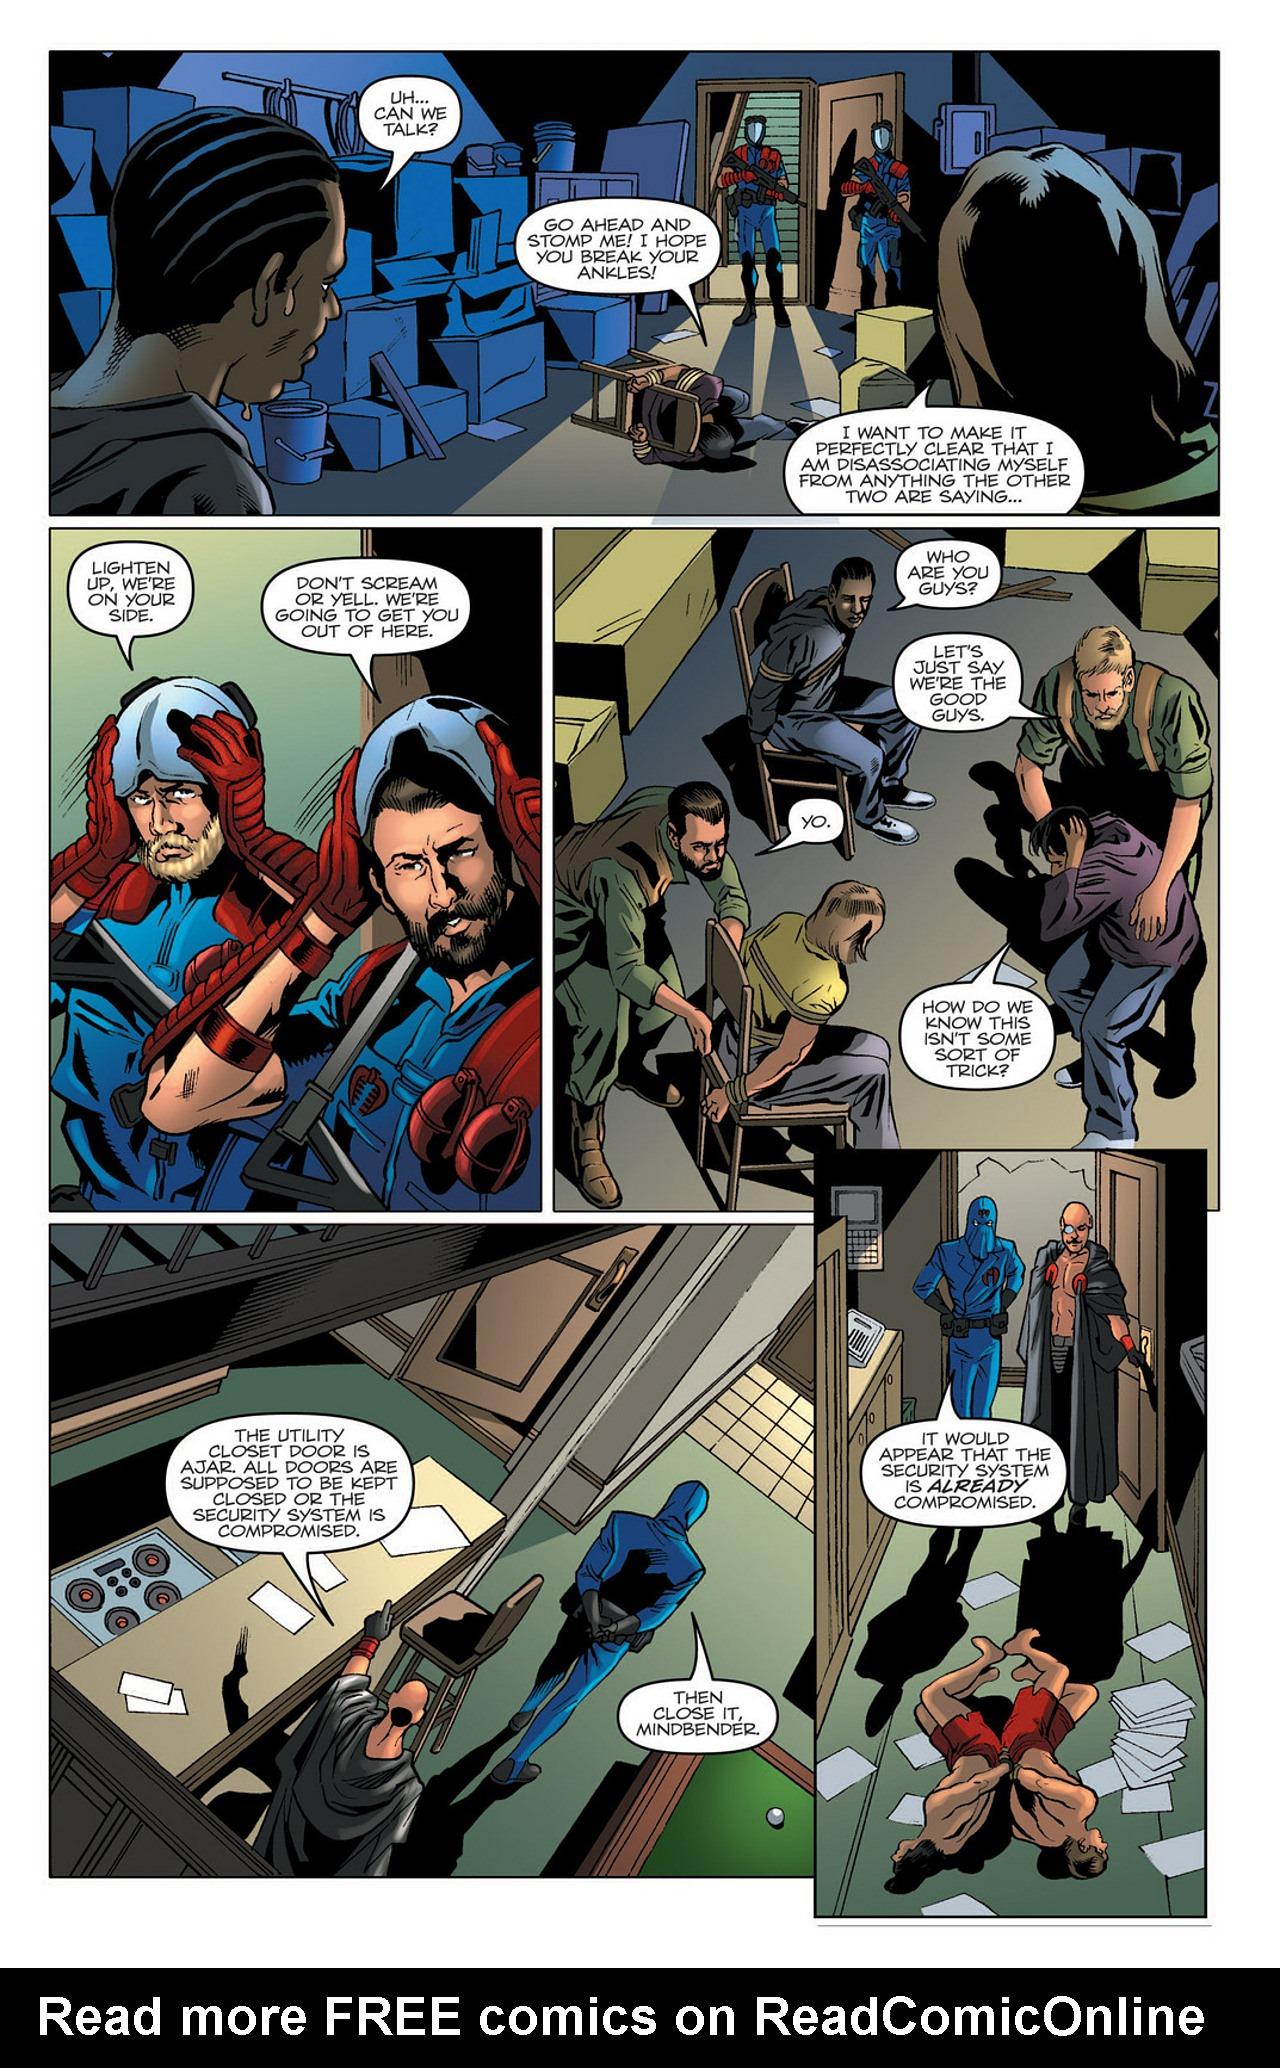 G.I. Joe: A Real American Hero 184 Page 7